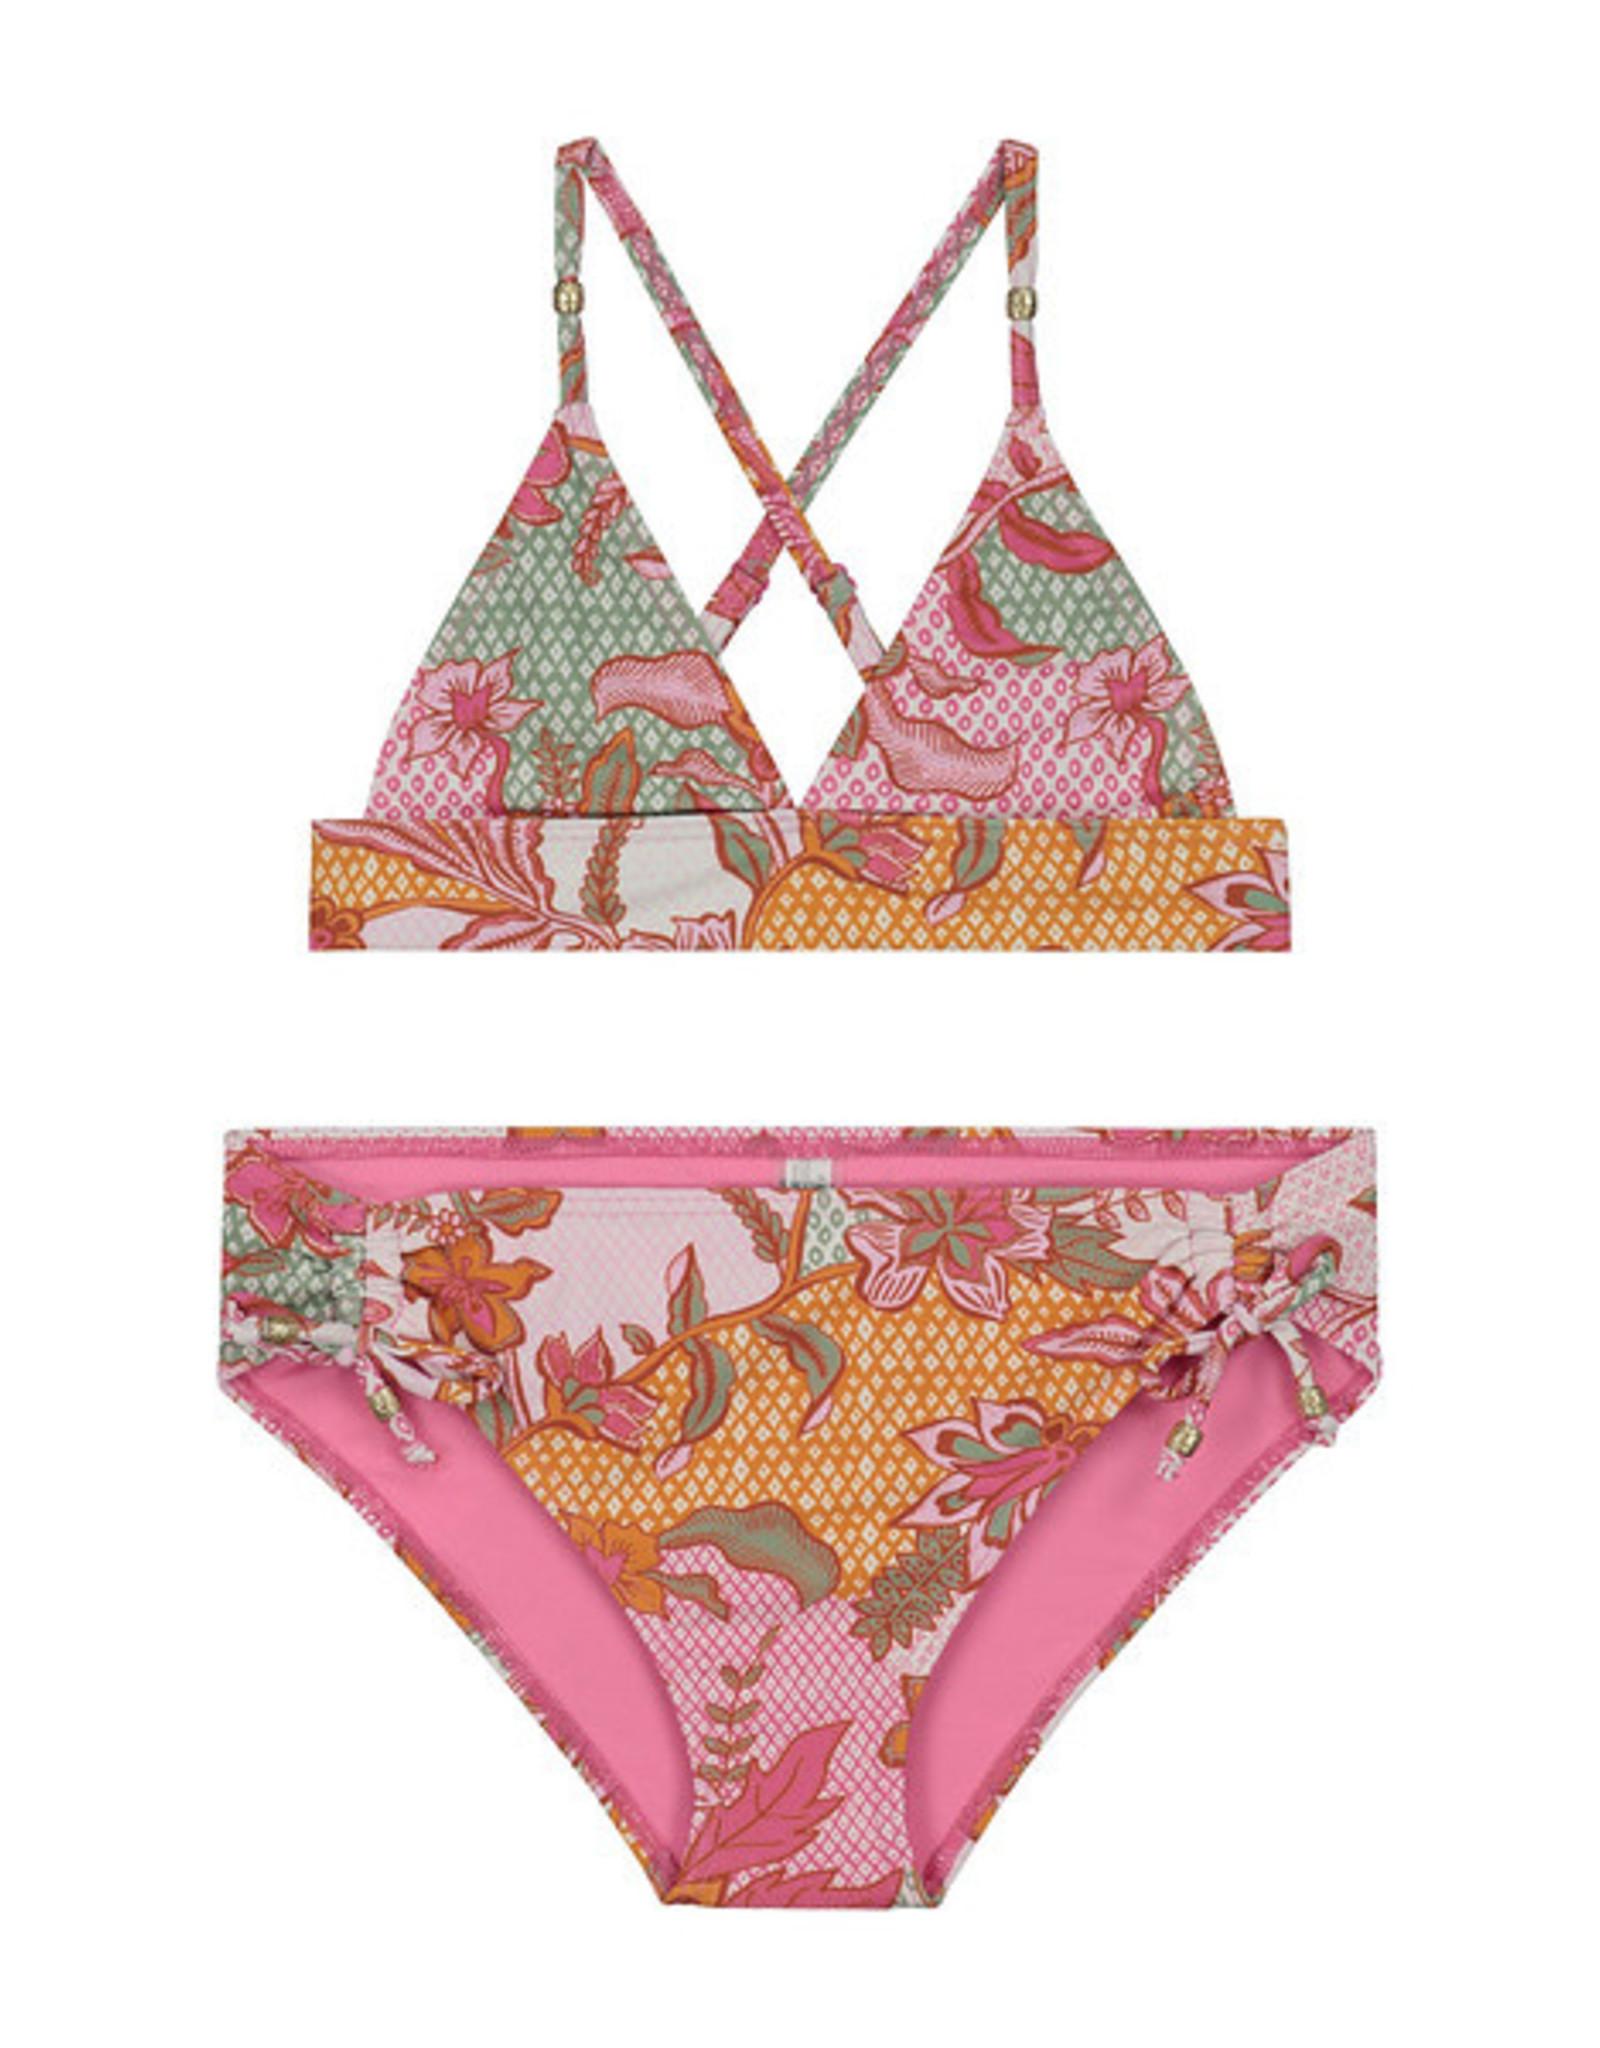 Shiwi Shiwi bikini batik halter triangle bloemenprint